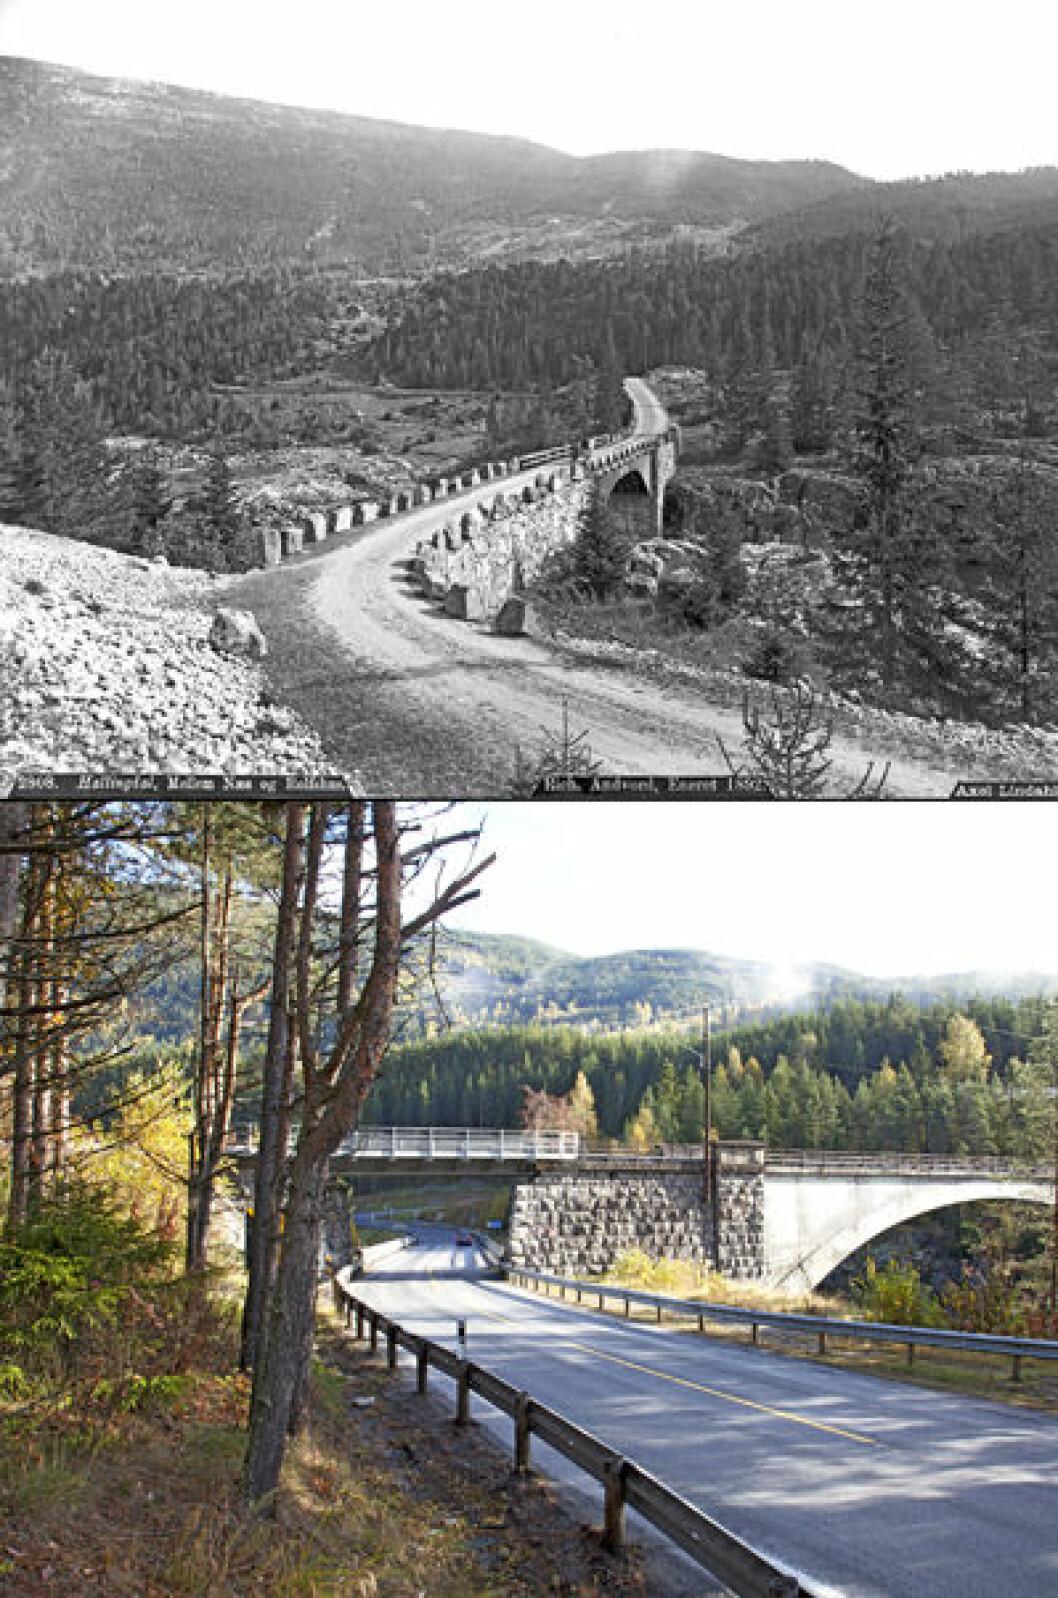 1890 og 2013: Svenkerud bro i Nes i Hallingdal, Buskerud. Foto: Axel Lindahl/Oscar Puschmann